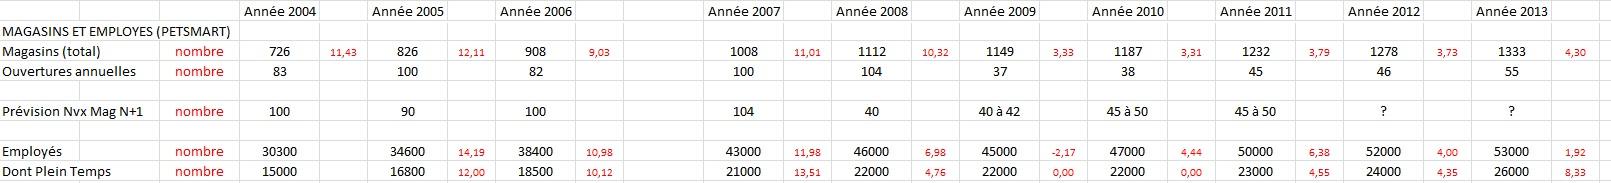 http://maxicool5.free.fr/Bourse/VALO%20PetSmart/Evo%20mag%20employes%20PS.jpg